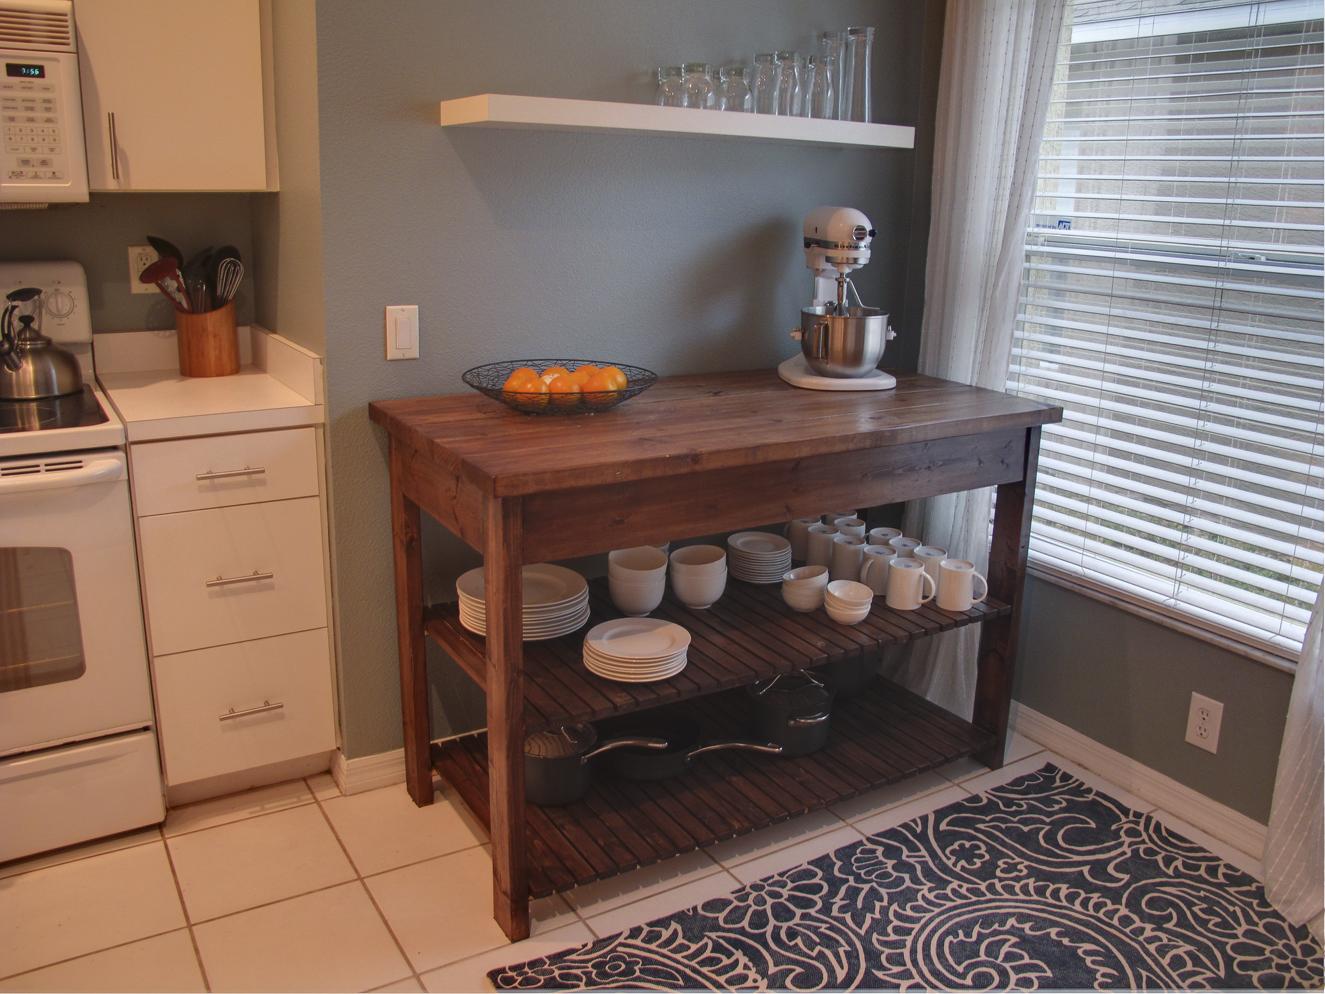 Domestic jenny diy kitchen island plans for Bulkhead kitchen designs